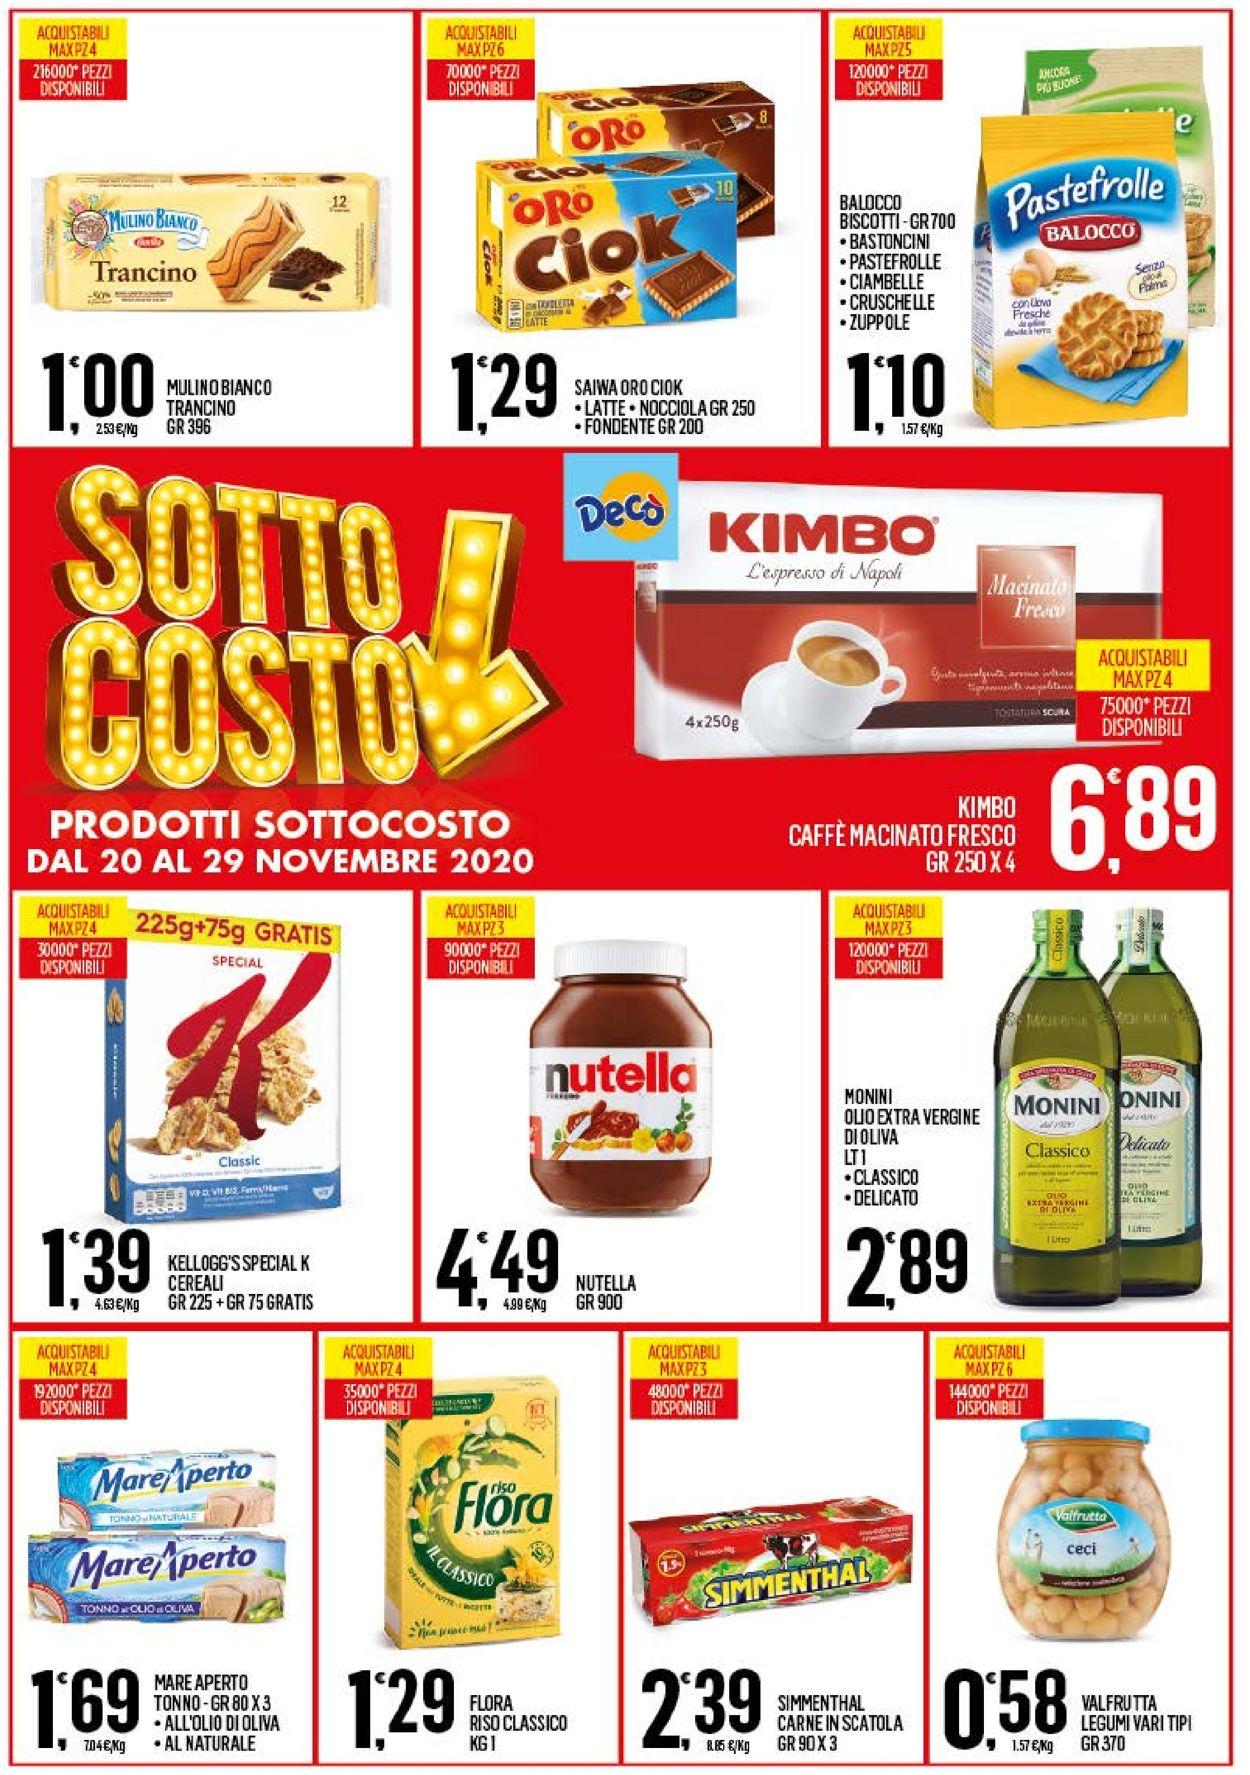 Volantino Deco - Black Friday 2020 - Offerte 20/11-29/11/2020 (Pagina 3)